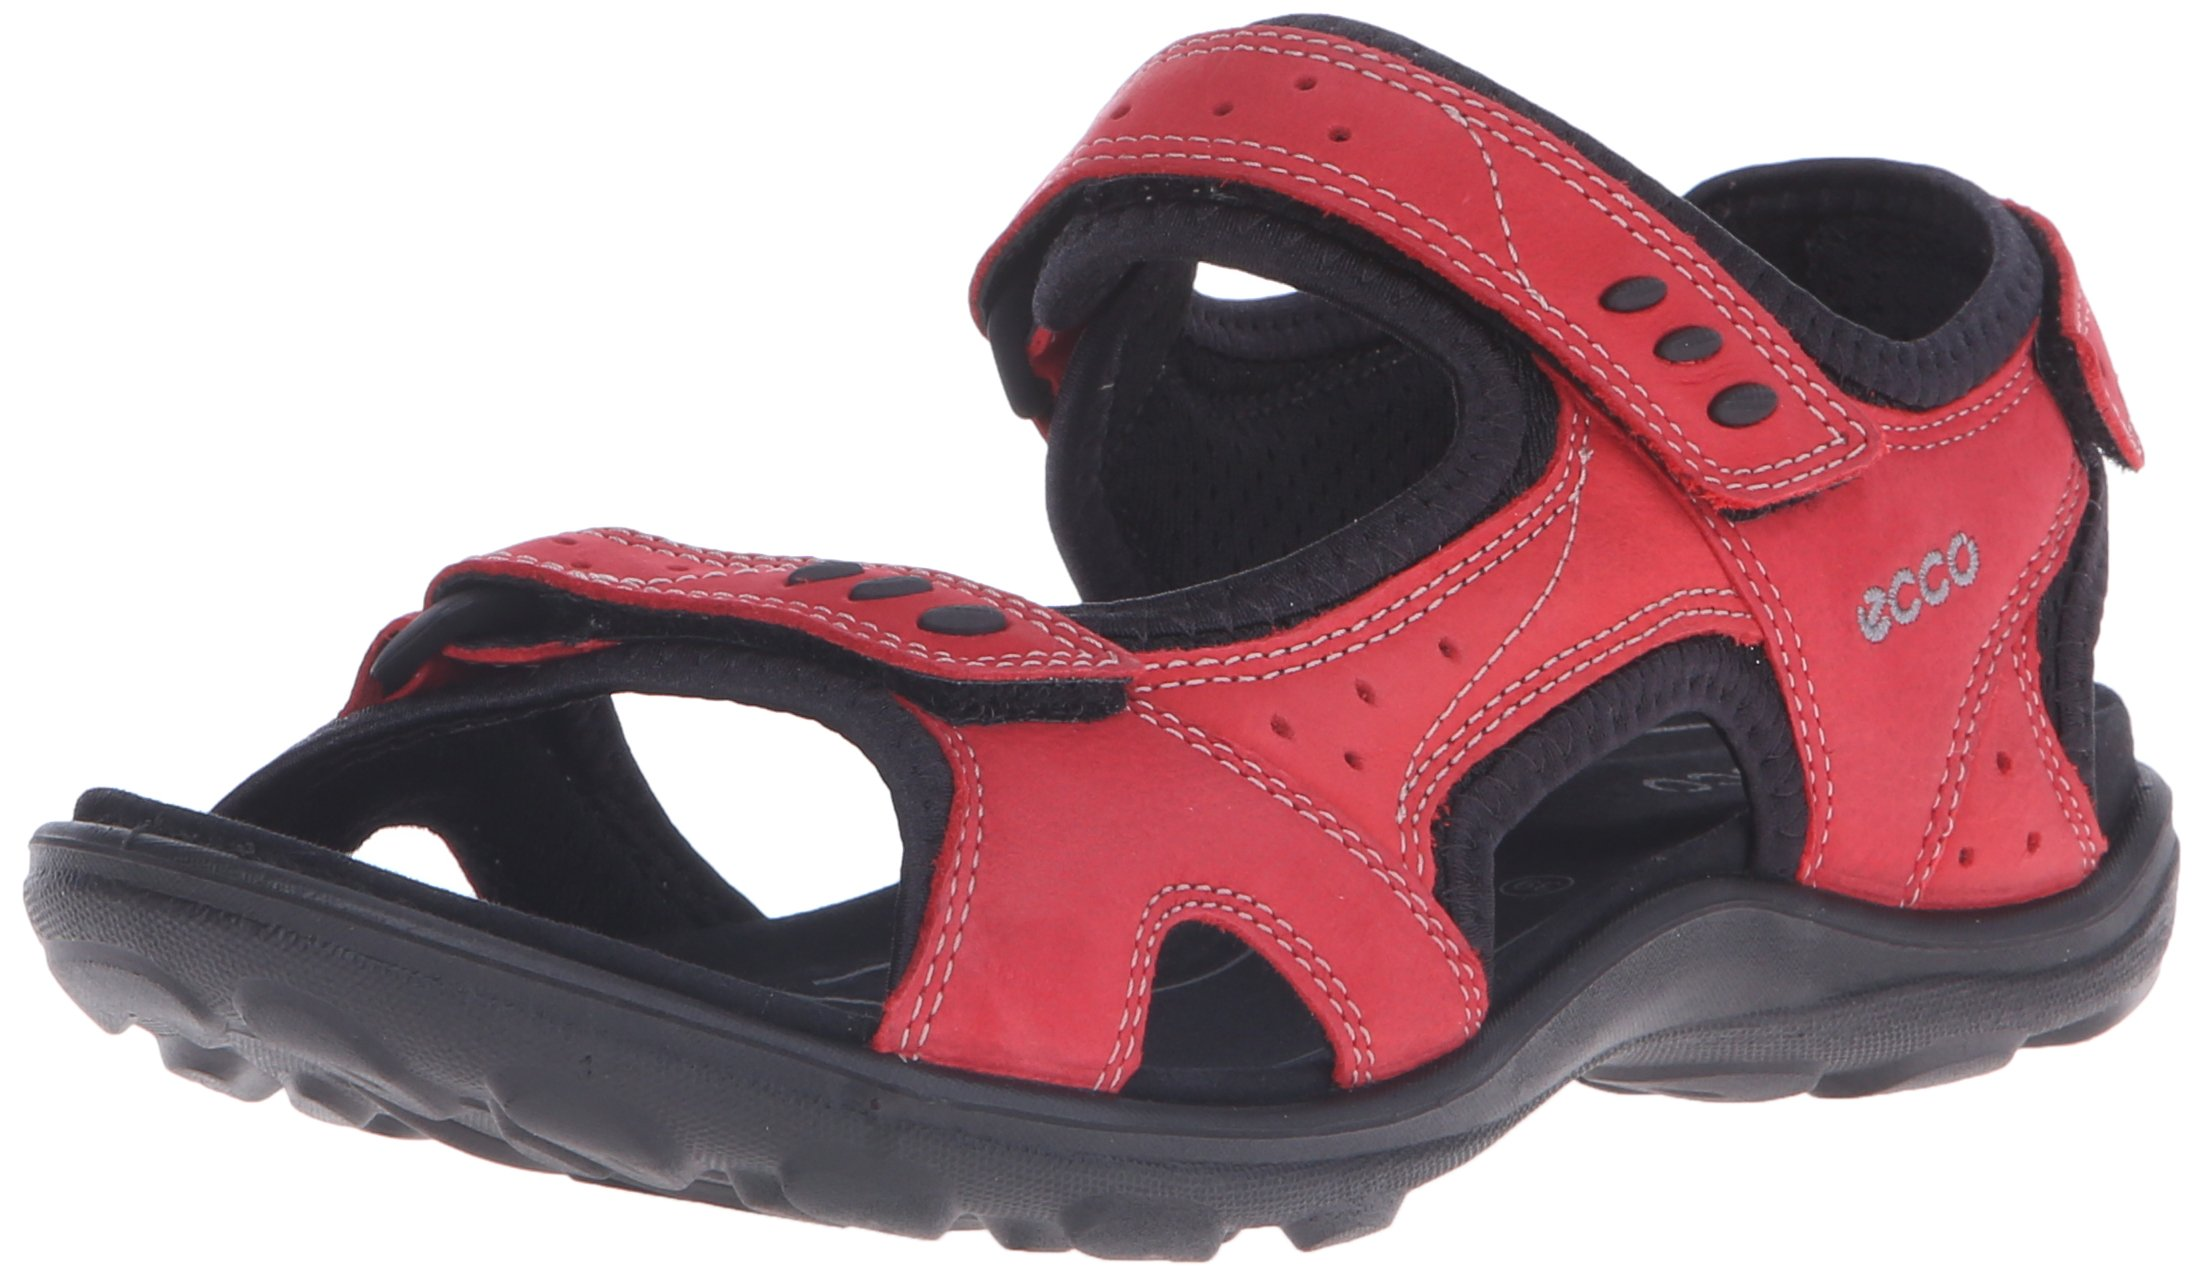 ECCO Women's Kana Sandal-W, Chili Red, 38 EU/7-7.5 M US